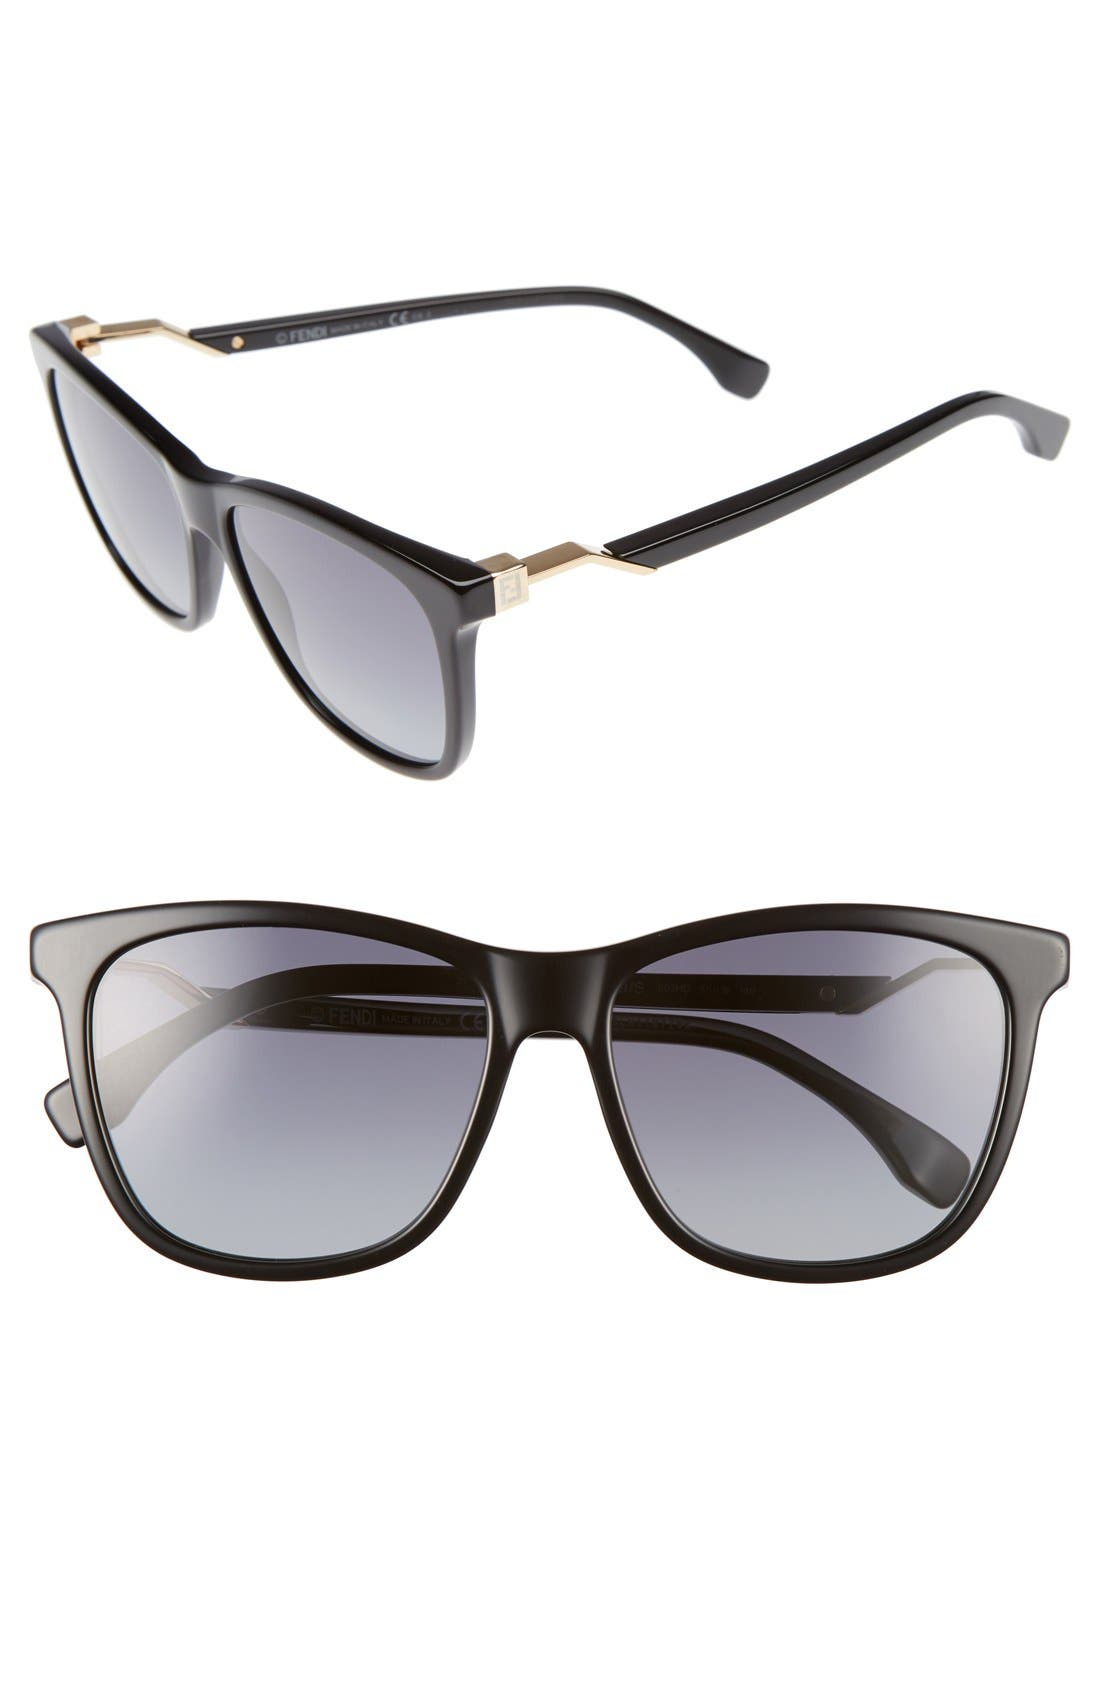 Alternate Image 1 Selected - Fendi 55mm Cube Retro Sunglasses